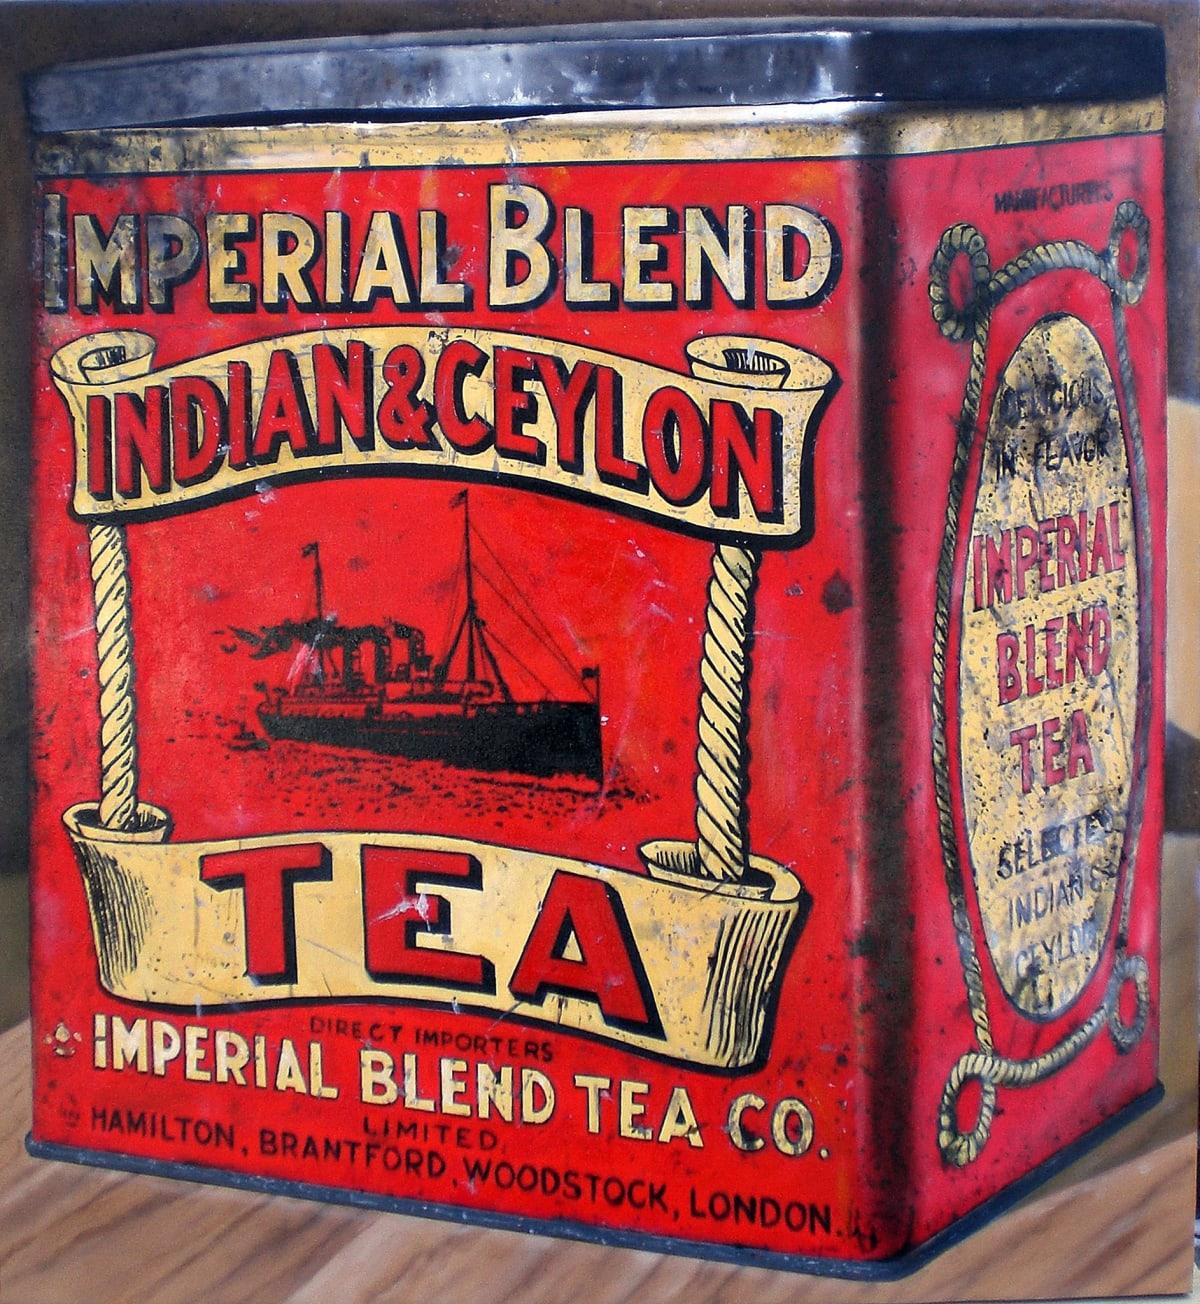 Cesar Santander Imperial Blend oil and acrylic on canvas 84 x 92 cm